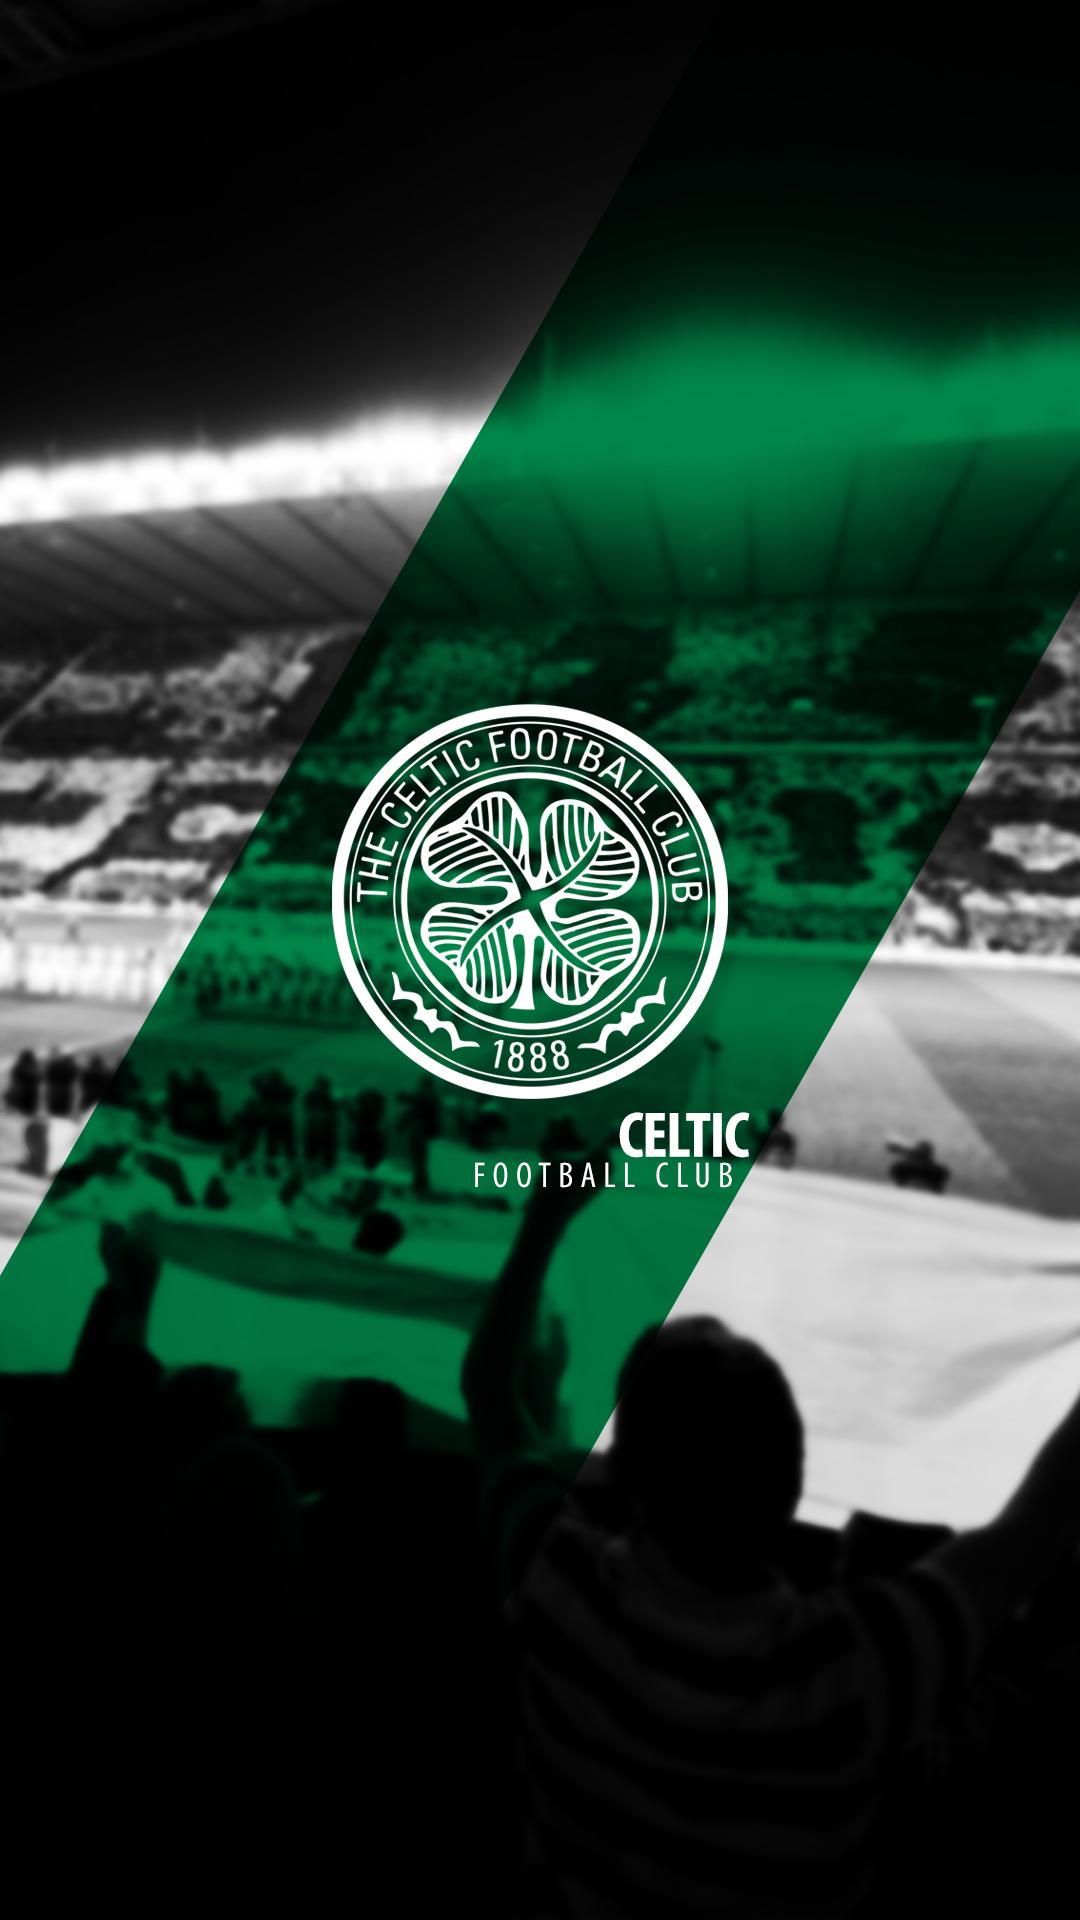 Celtic FC Wallpaper 10801920 01681 HD Wallpapers 1080x1920